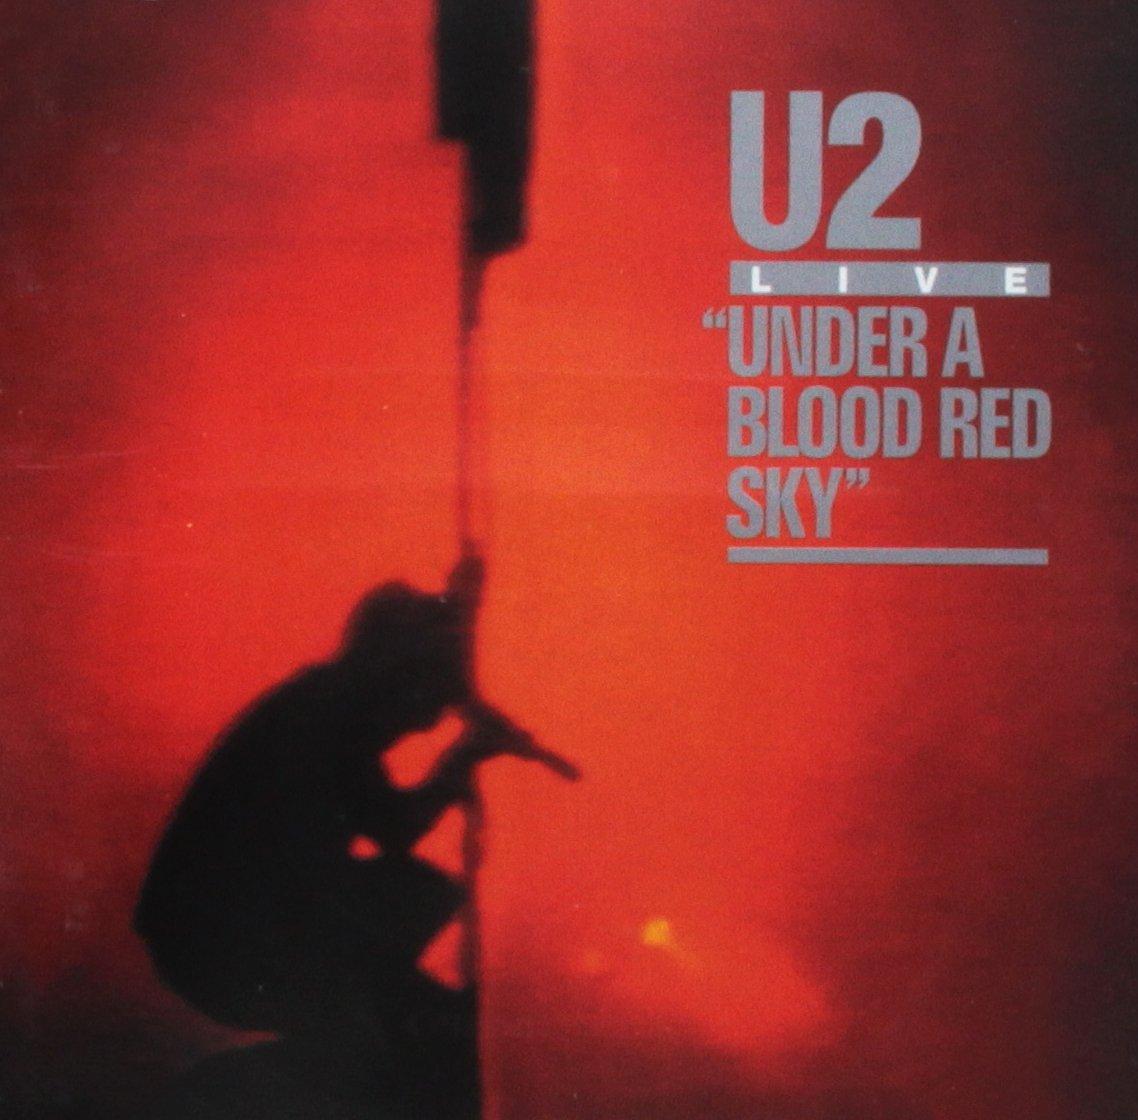 Under a Blood Red Sky (25th Anniversary Edt.) - U2: Amazon.de: Musik